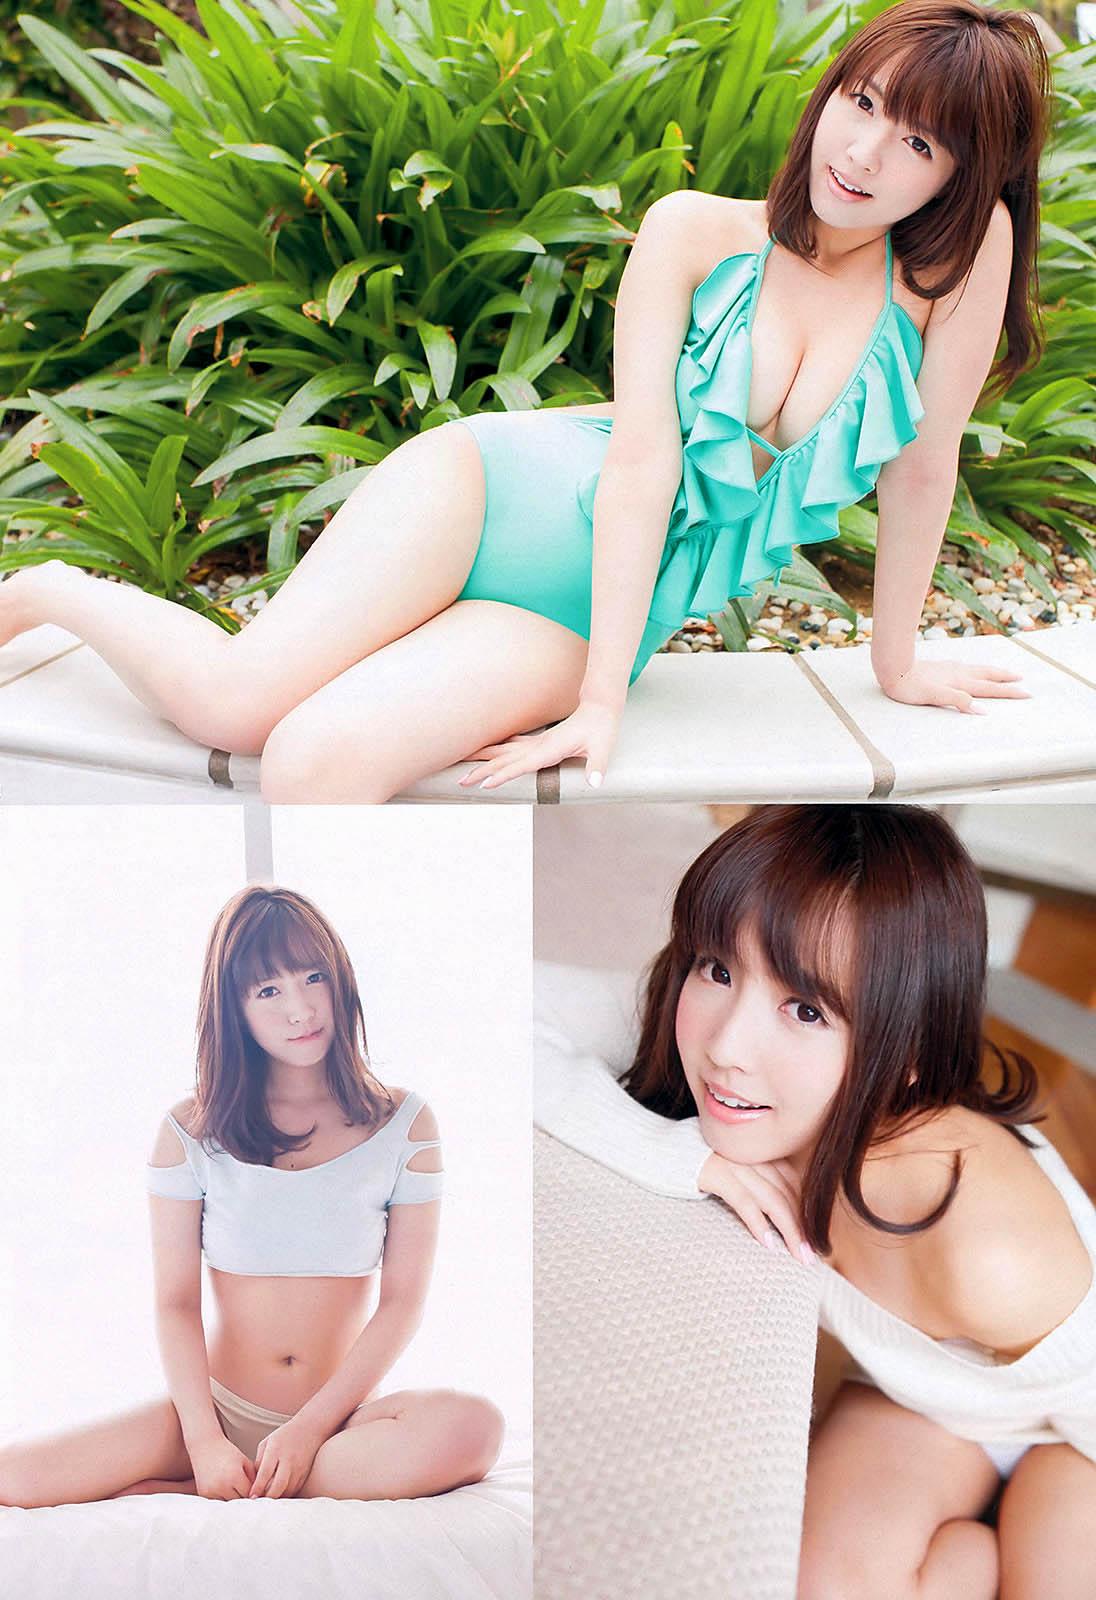 YMikami WPB 130710 03.jpg